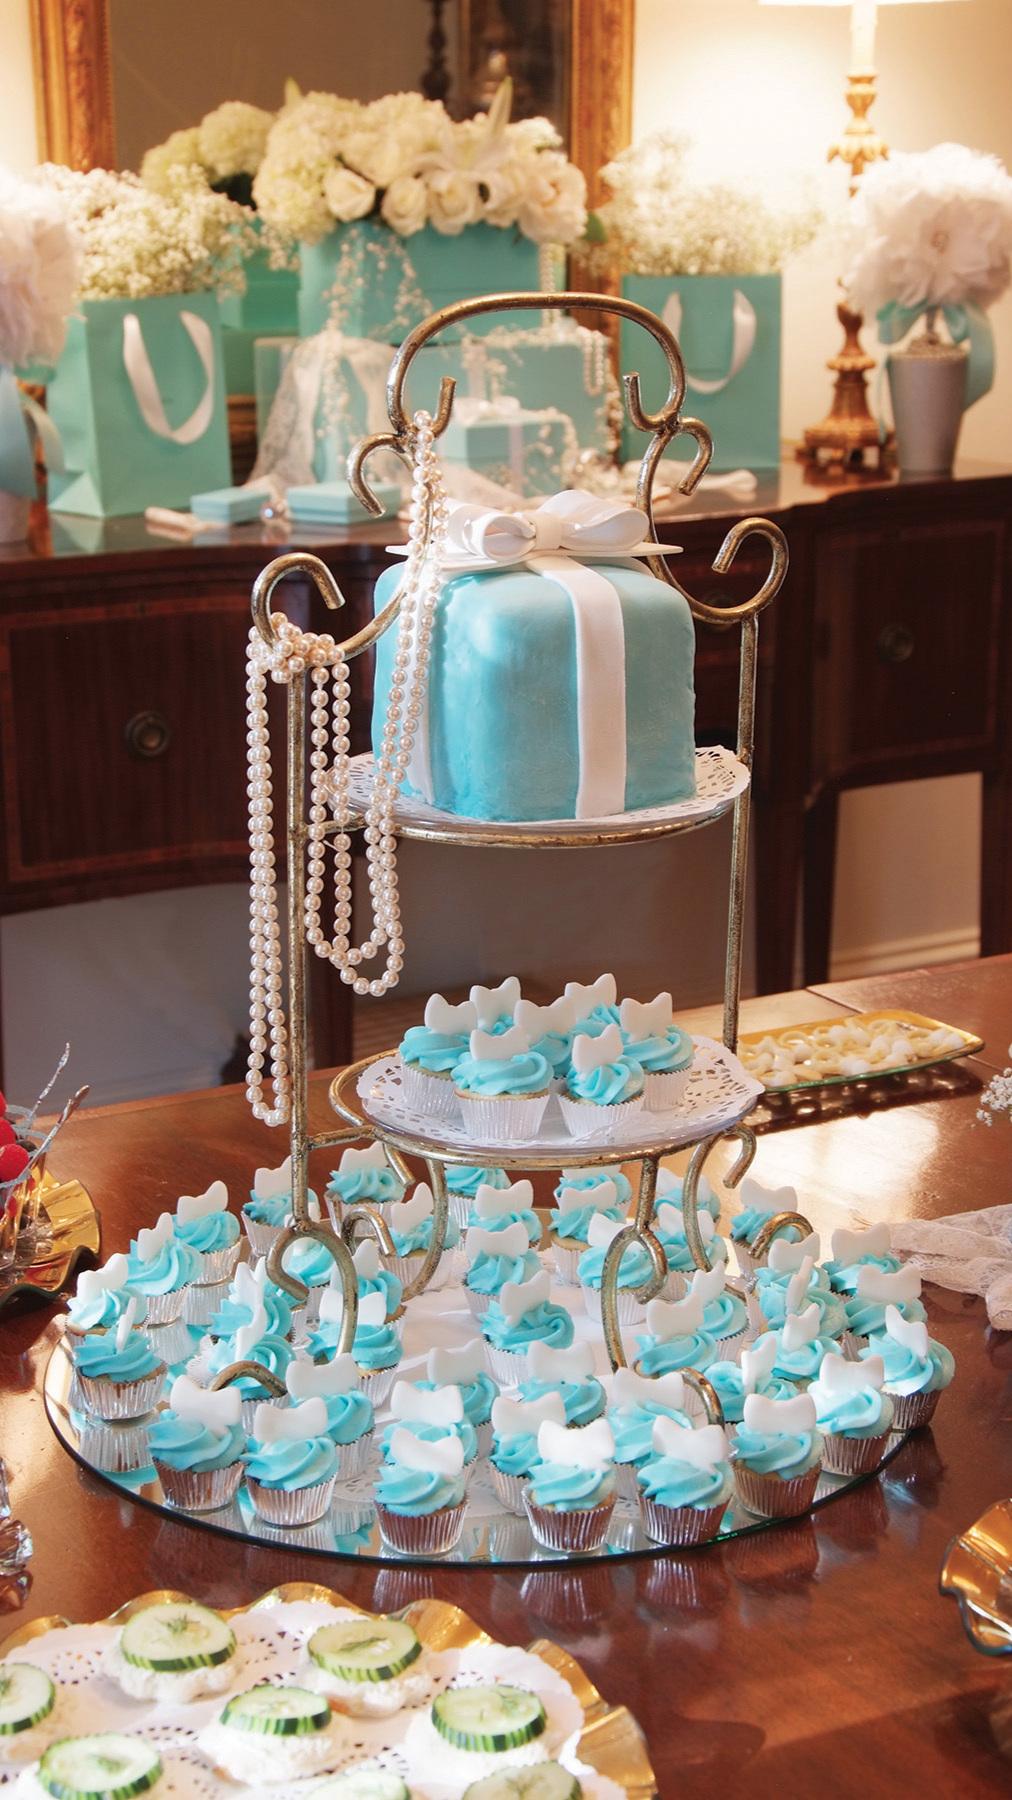 tifany+cupcakes-pic5.jpg